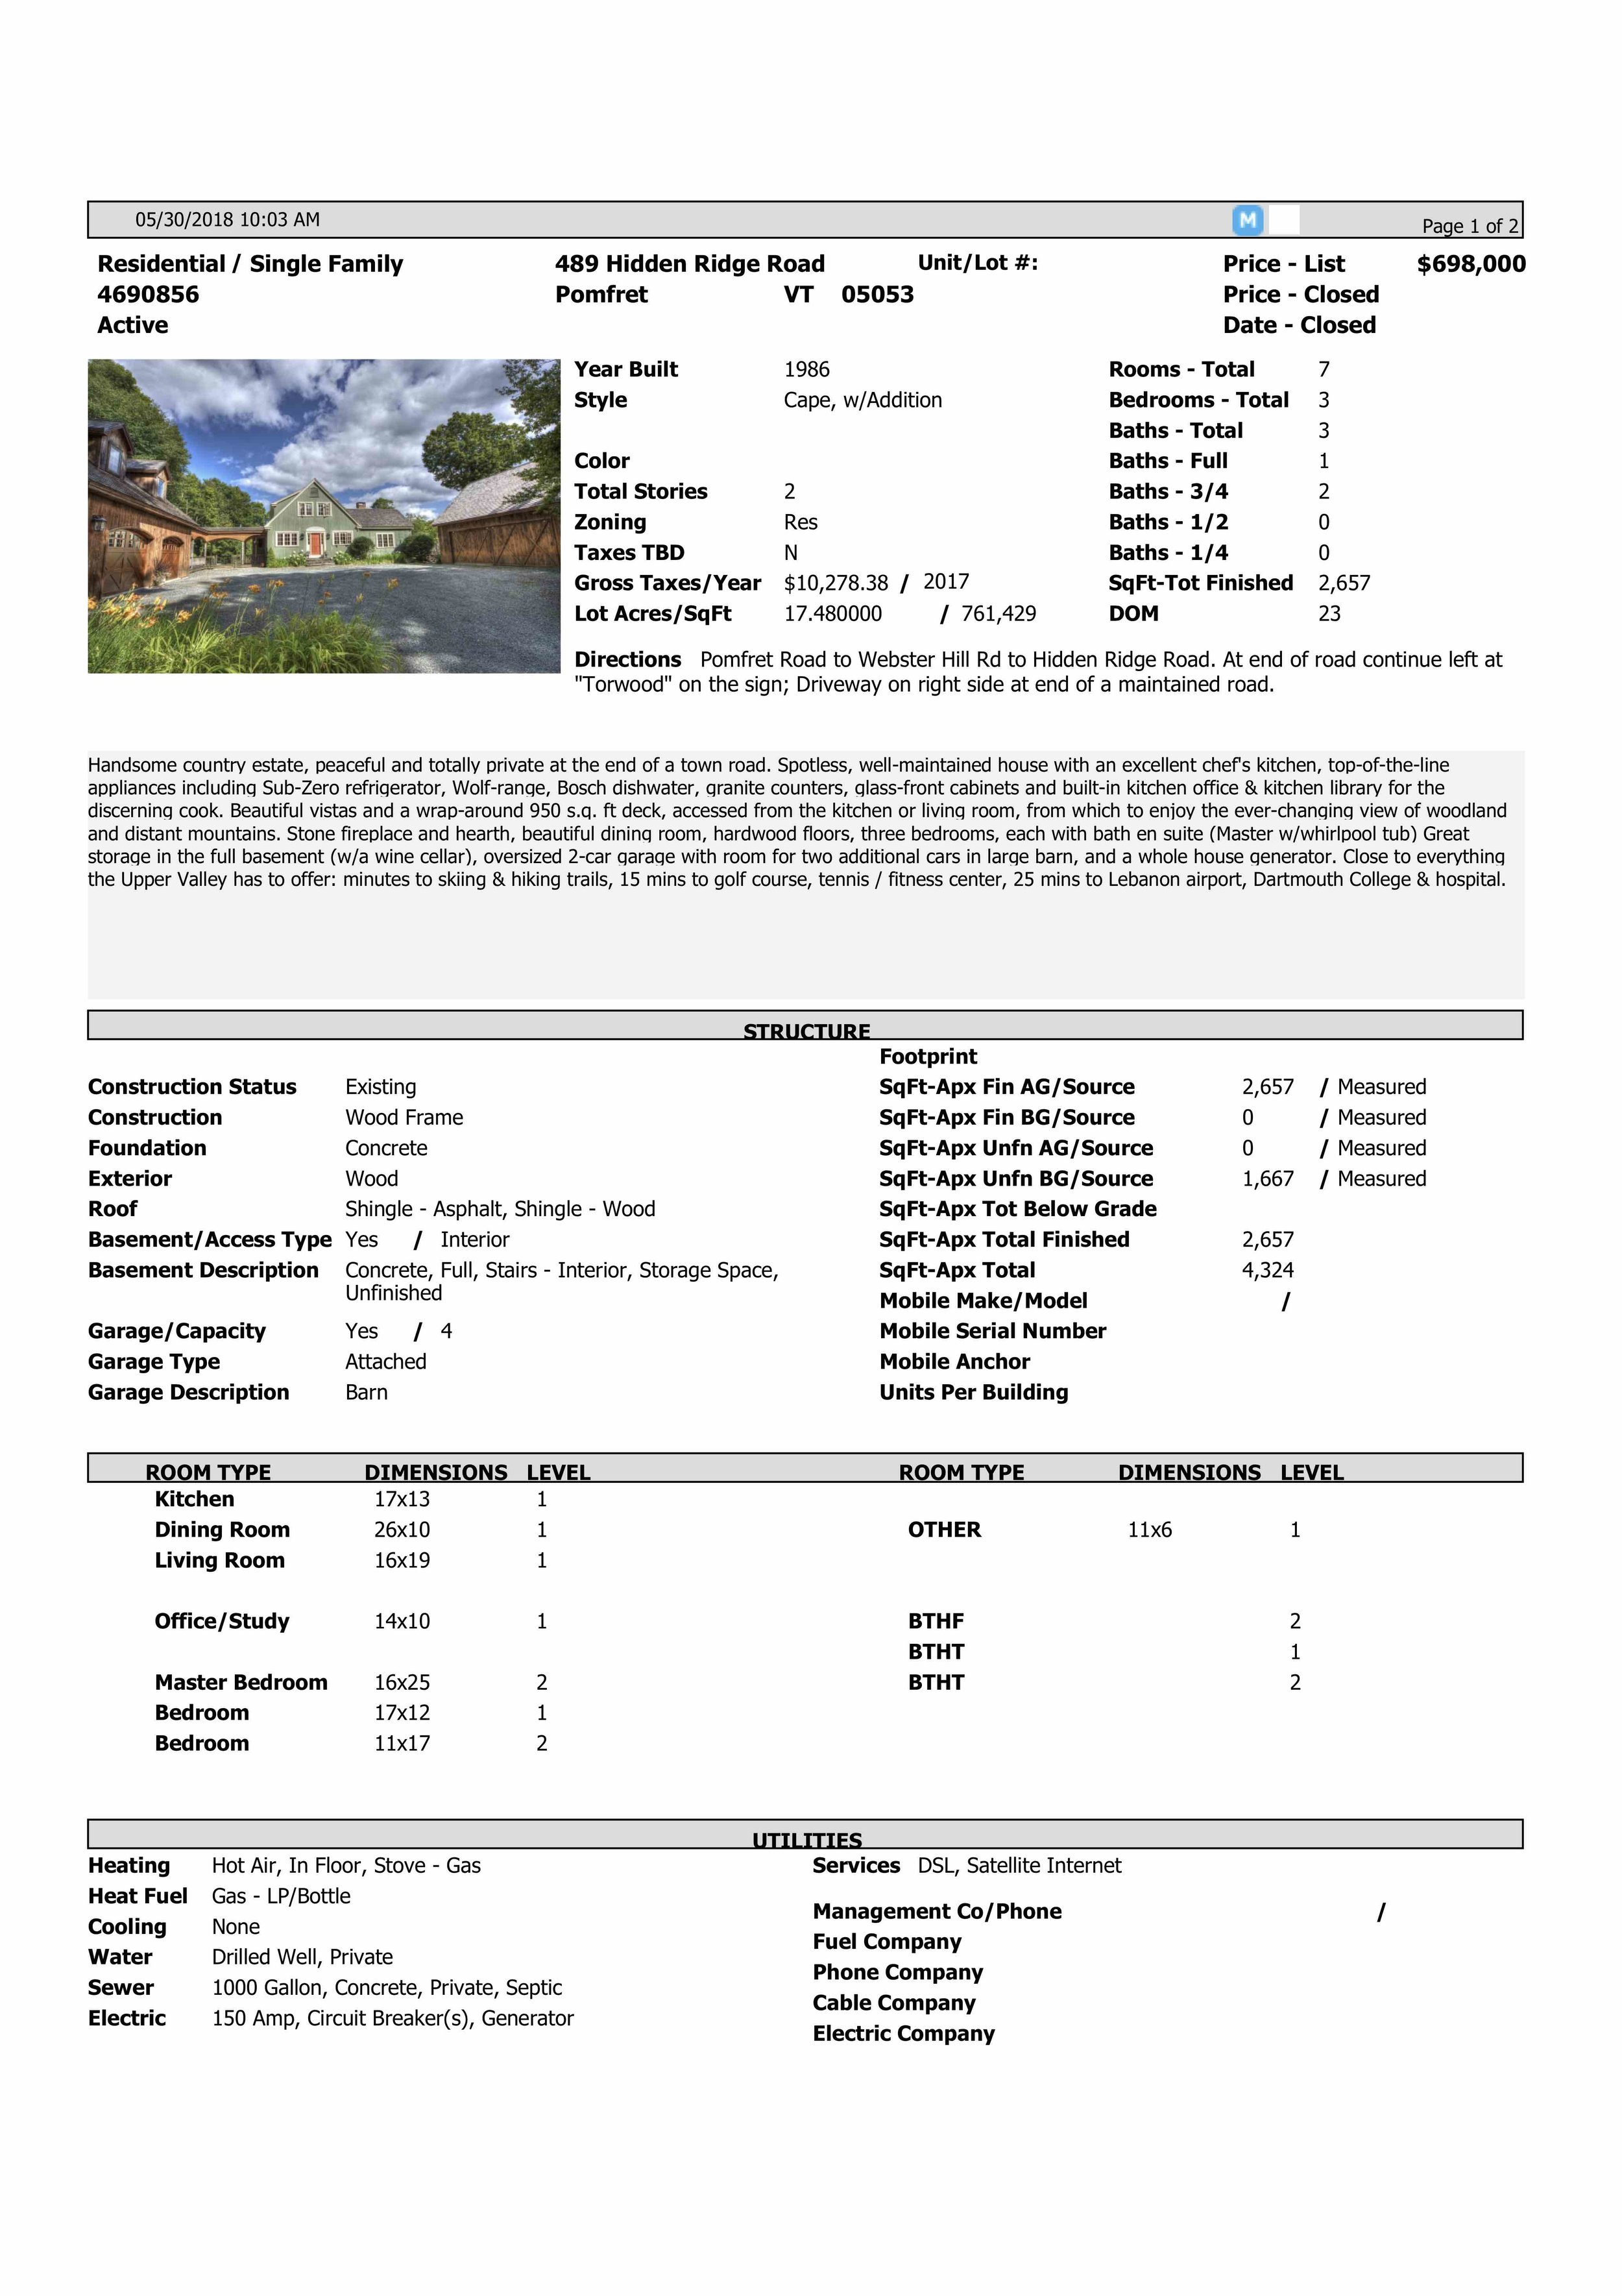 Hidden Ridge Rd - MLS Details1.jpg